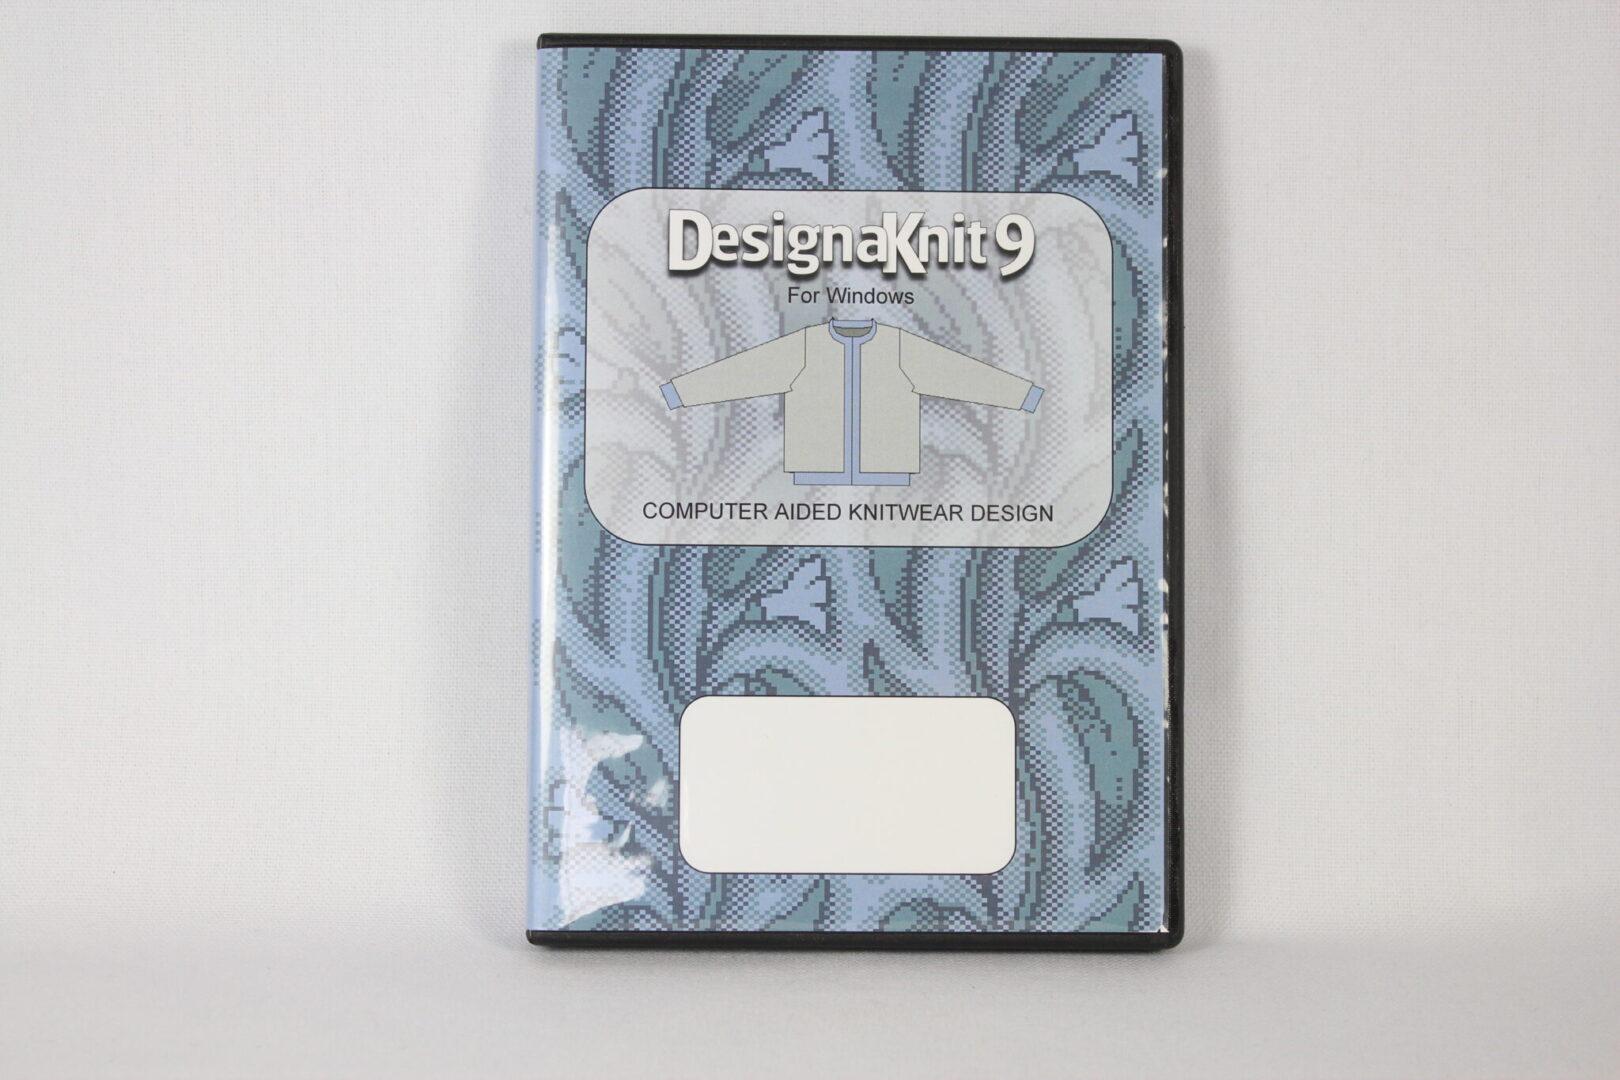 99601B Upgrade From DesignaKnit 8 Professional Version to DesignaKnit 9 Standard Version